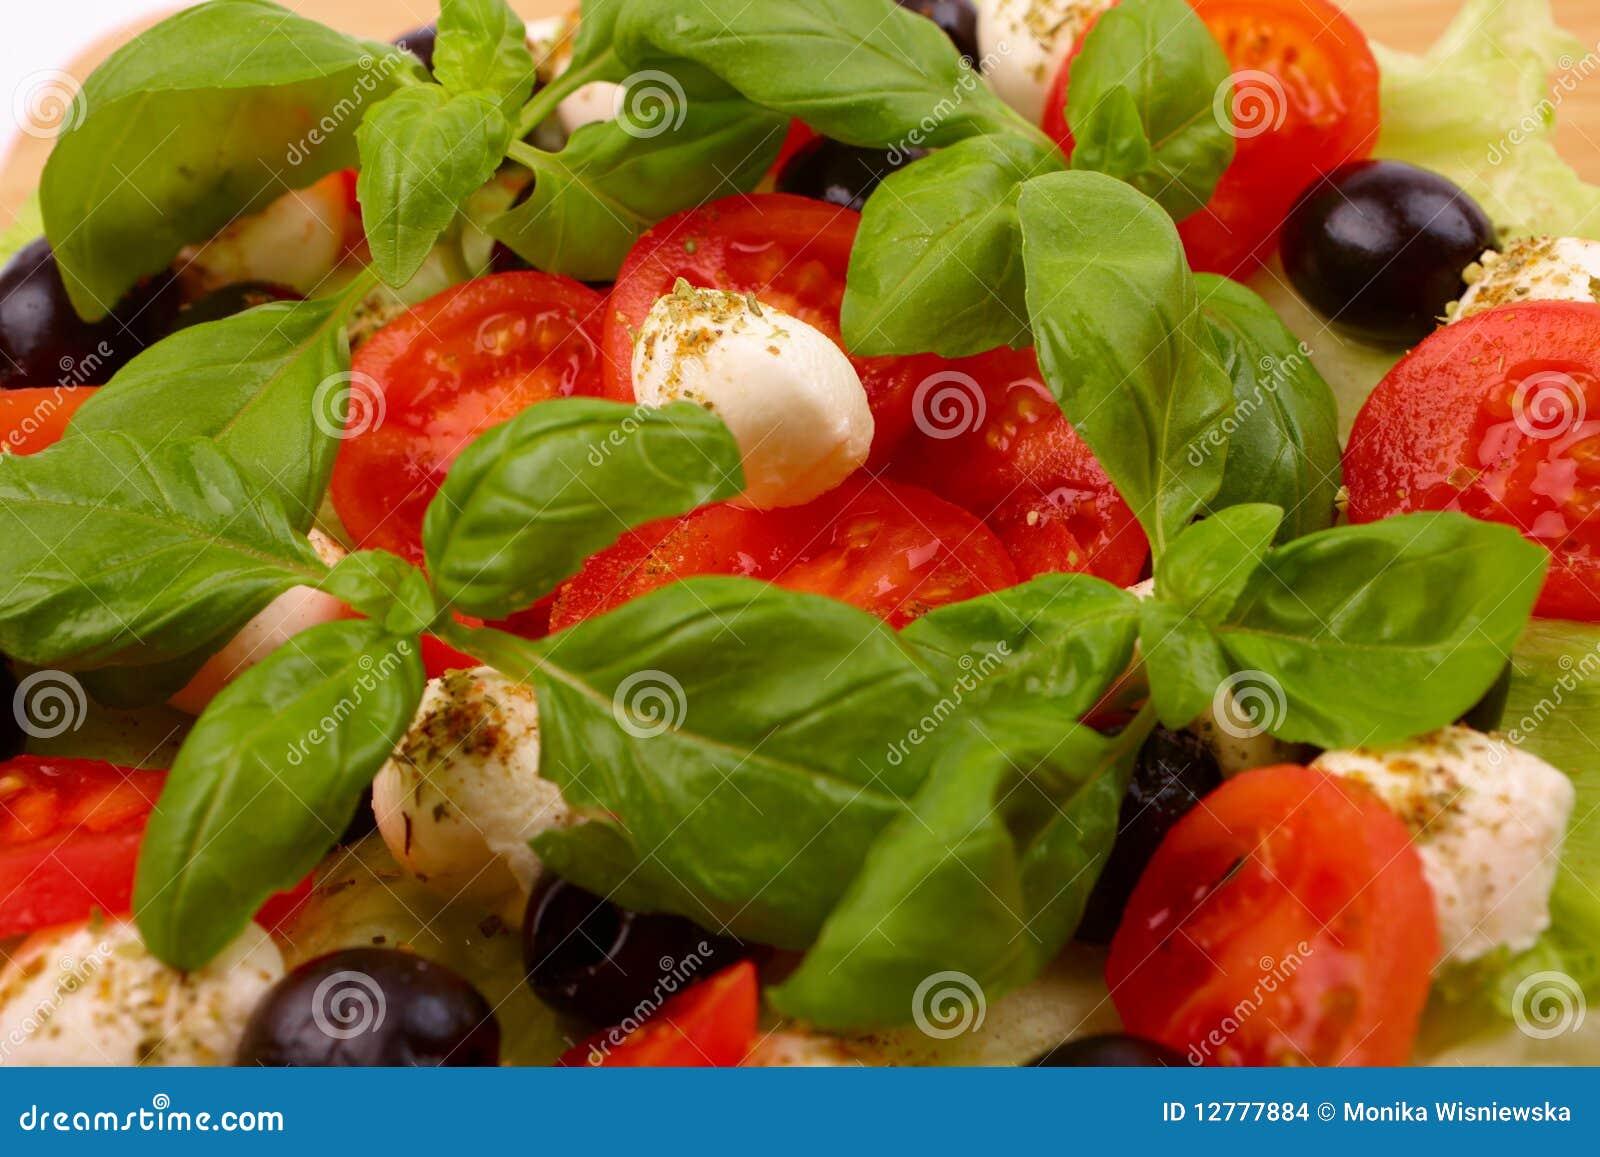 Salad with basil, mozzarella, olives and tomato